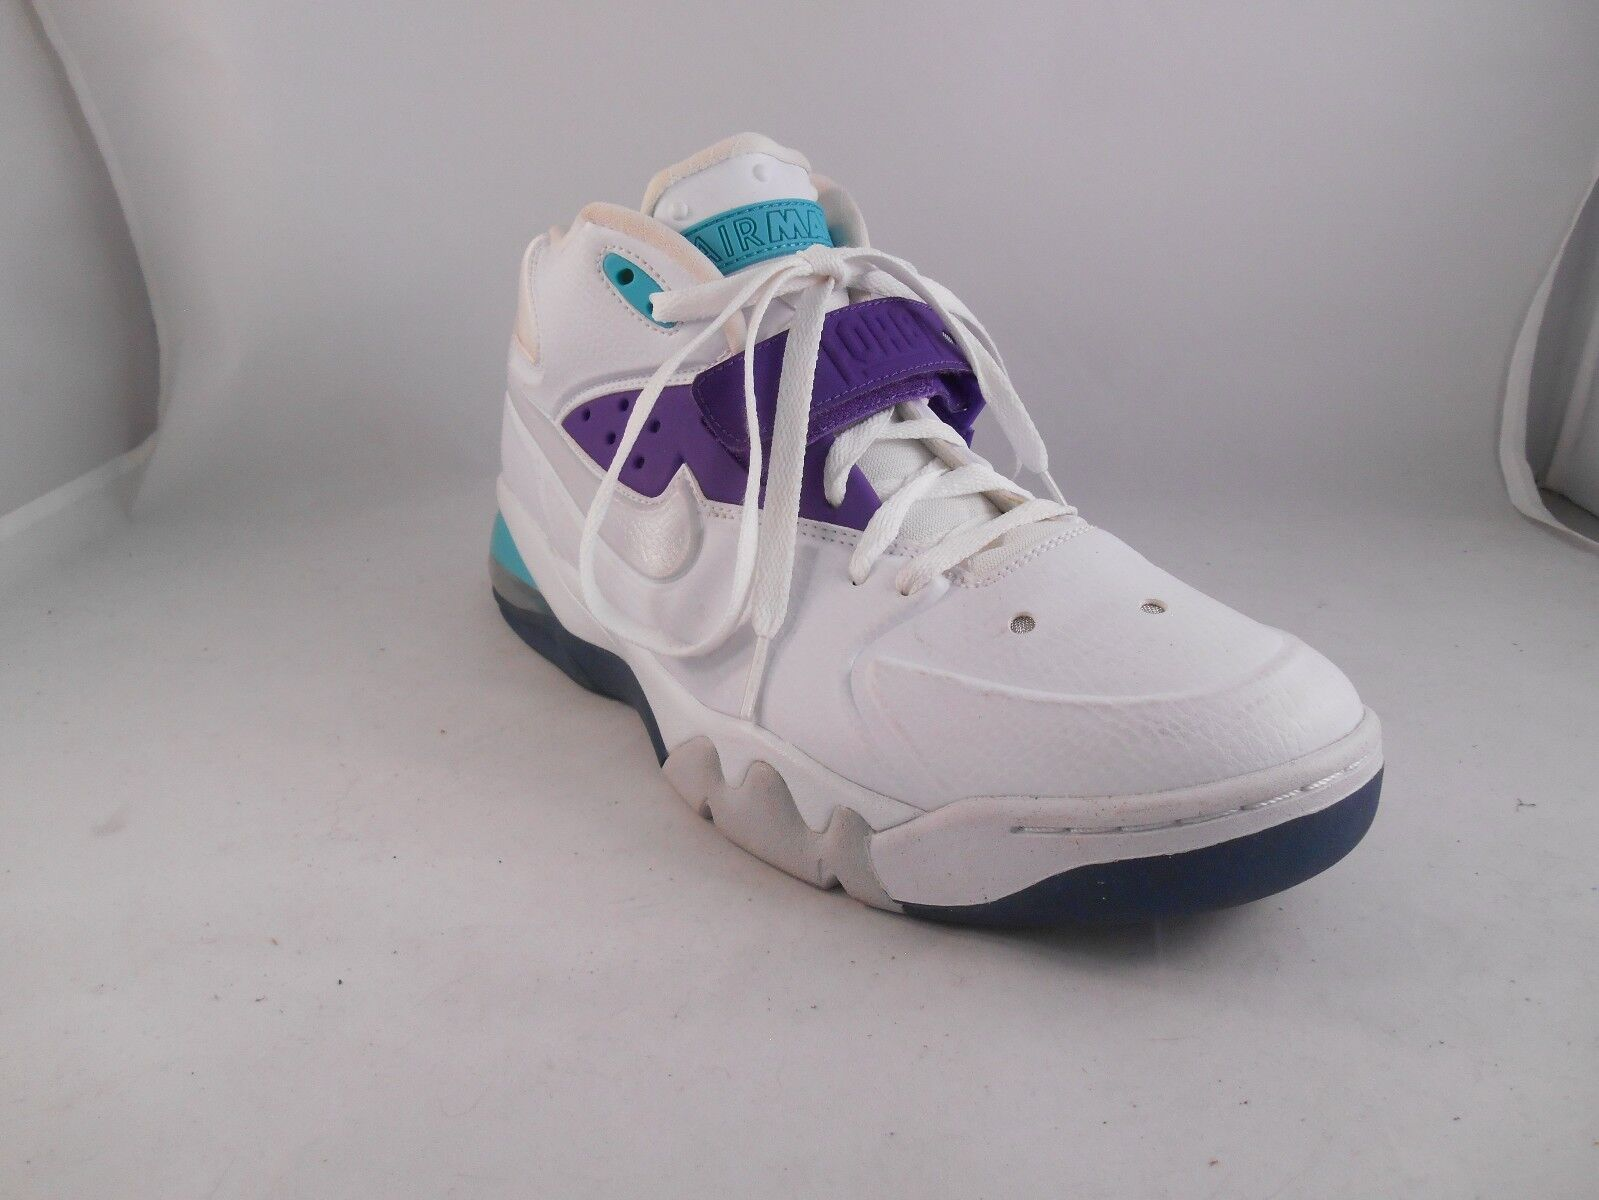 Nike air force max 2013 scarpe da basket 555105-101 uomini sz m / ue